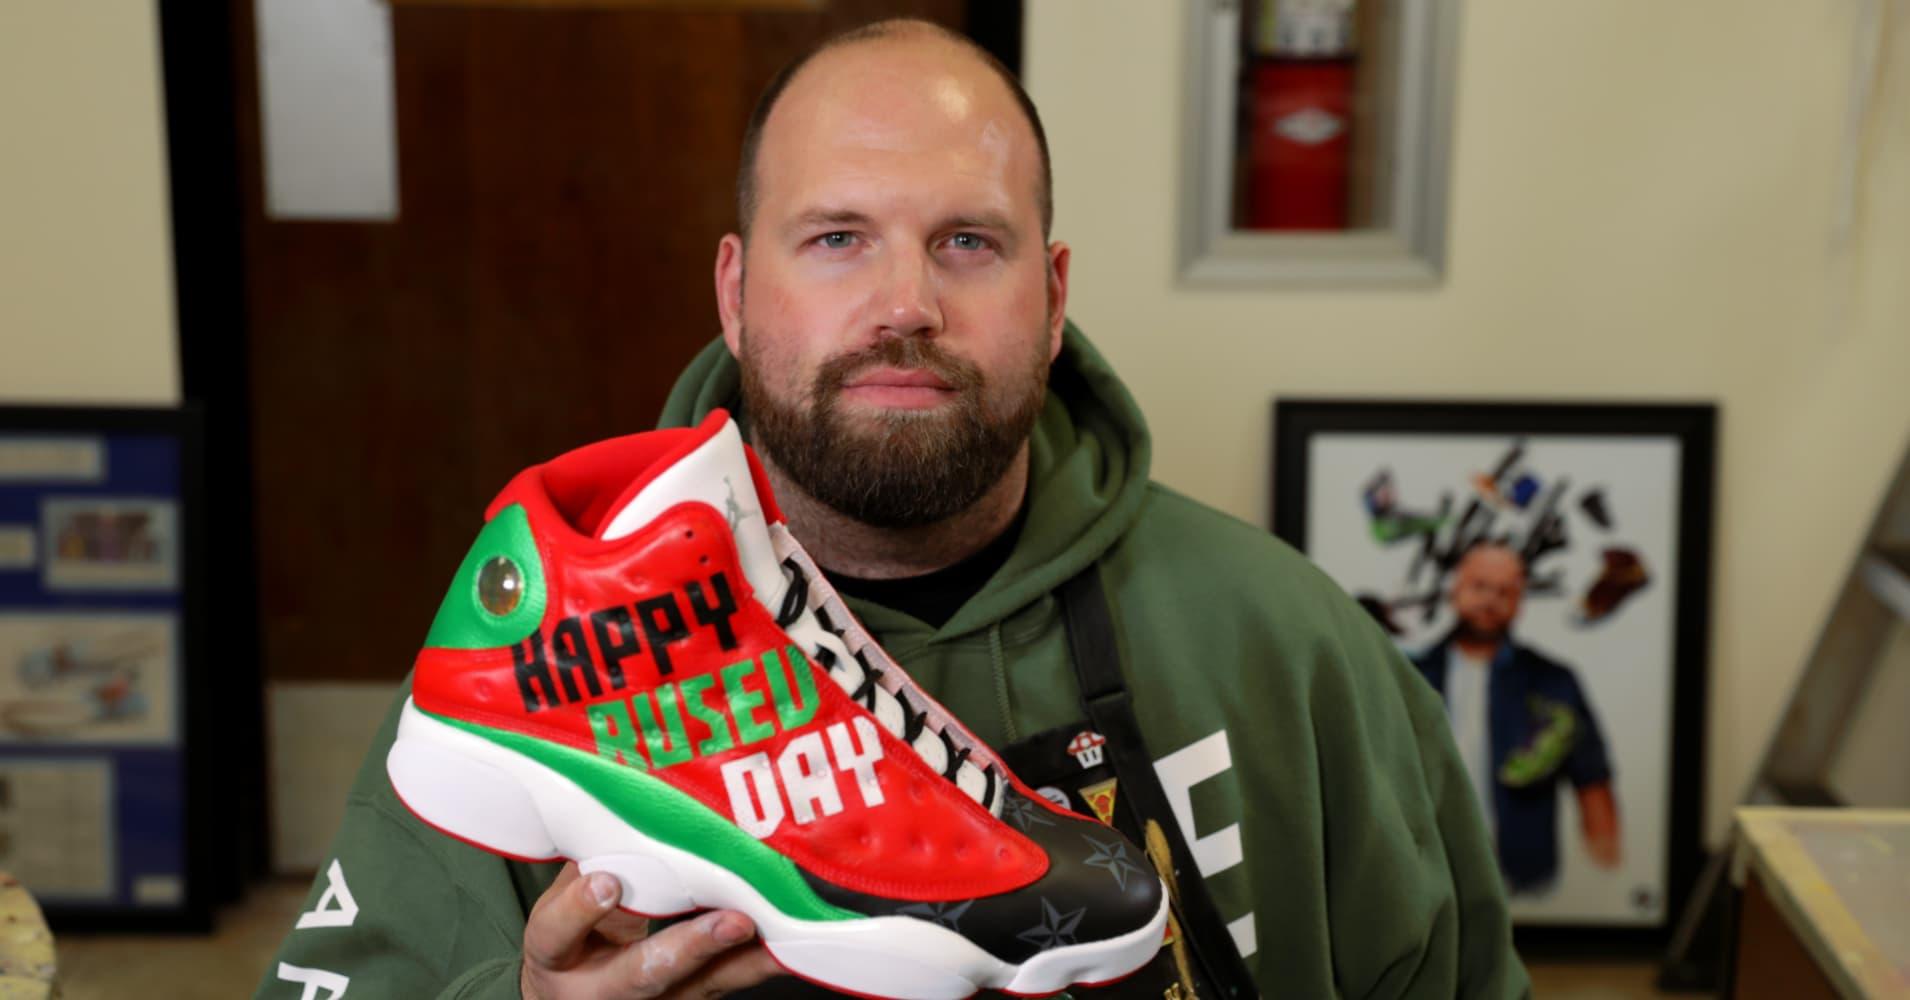 b0d016d03 Dan 'Mache' Gamache makes six figures as NFL's go-to sneaker artist